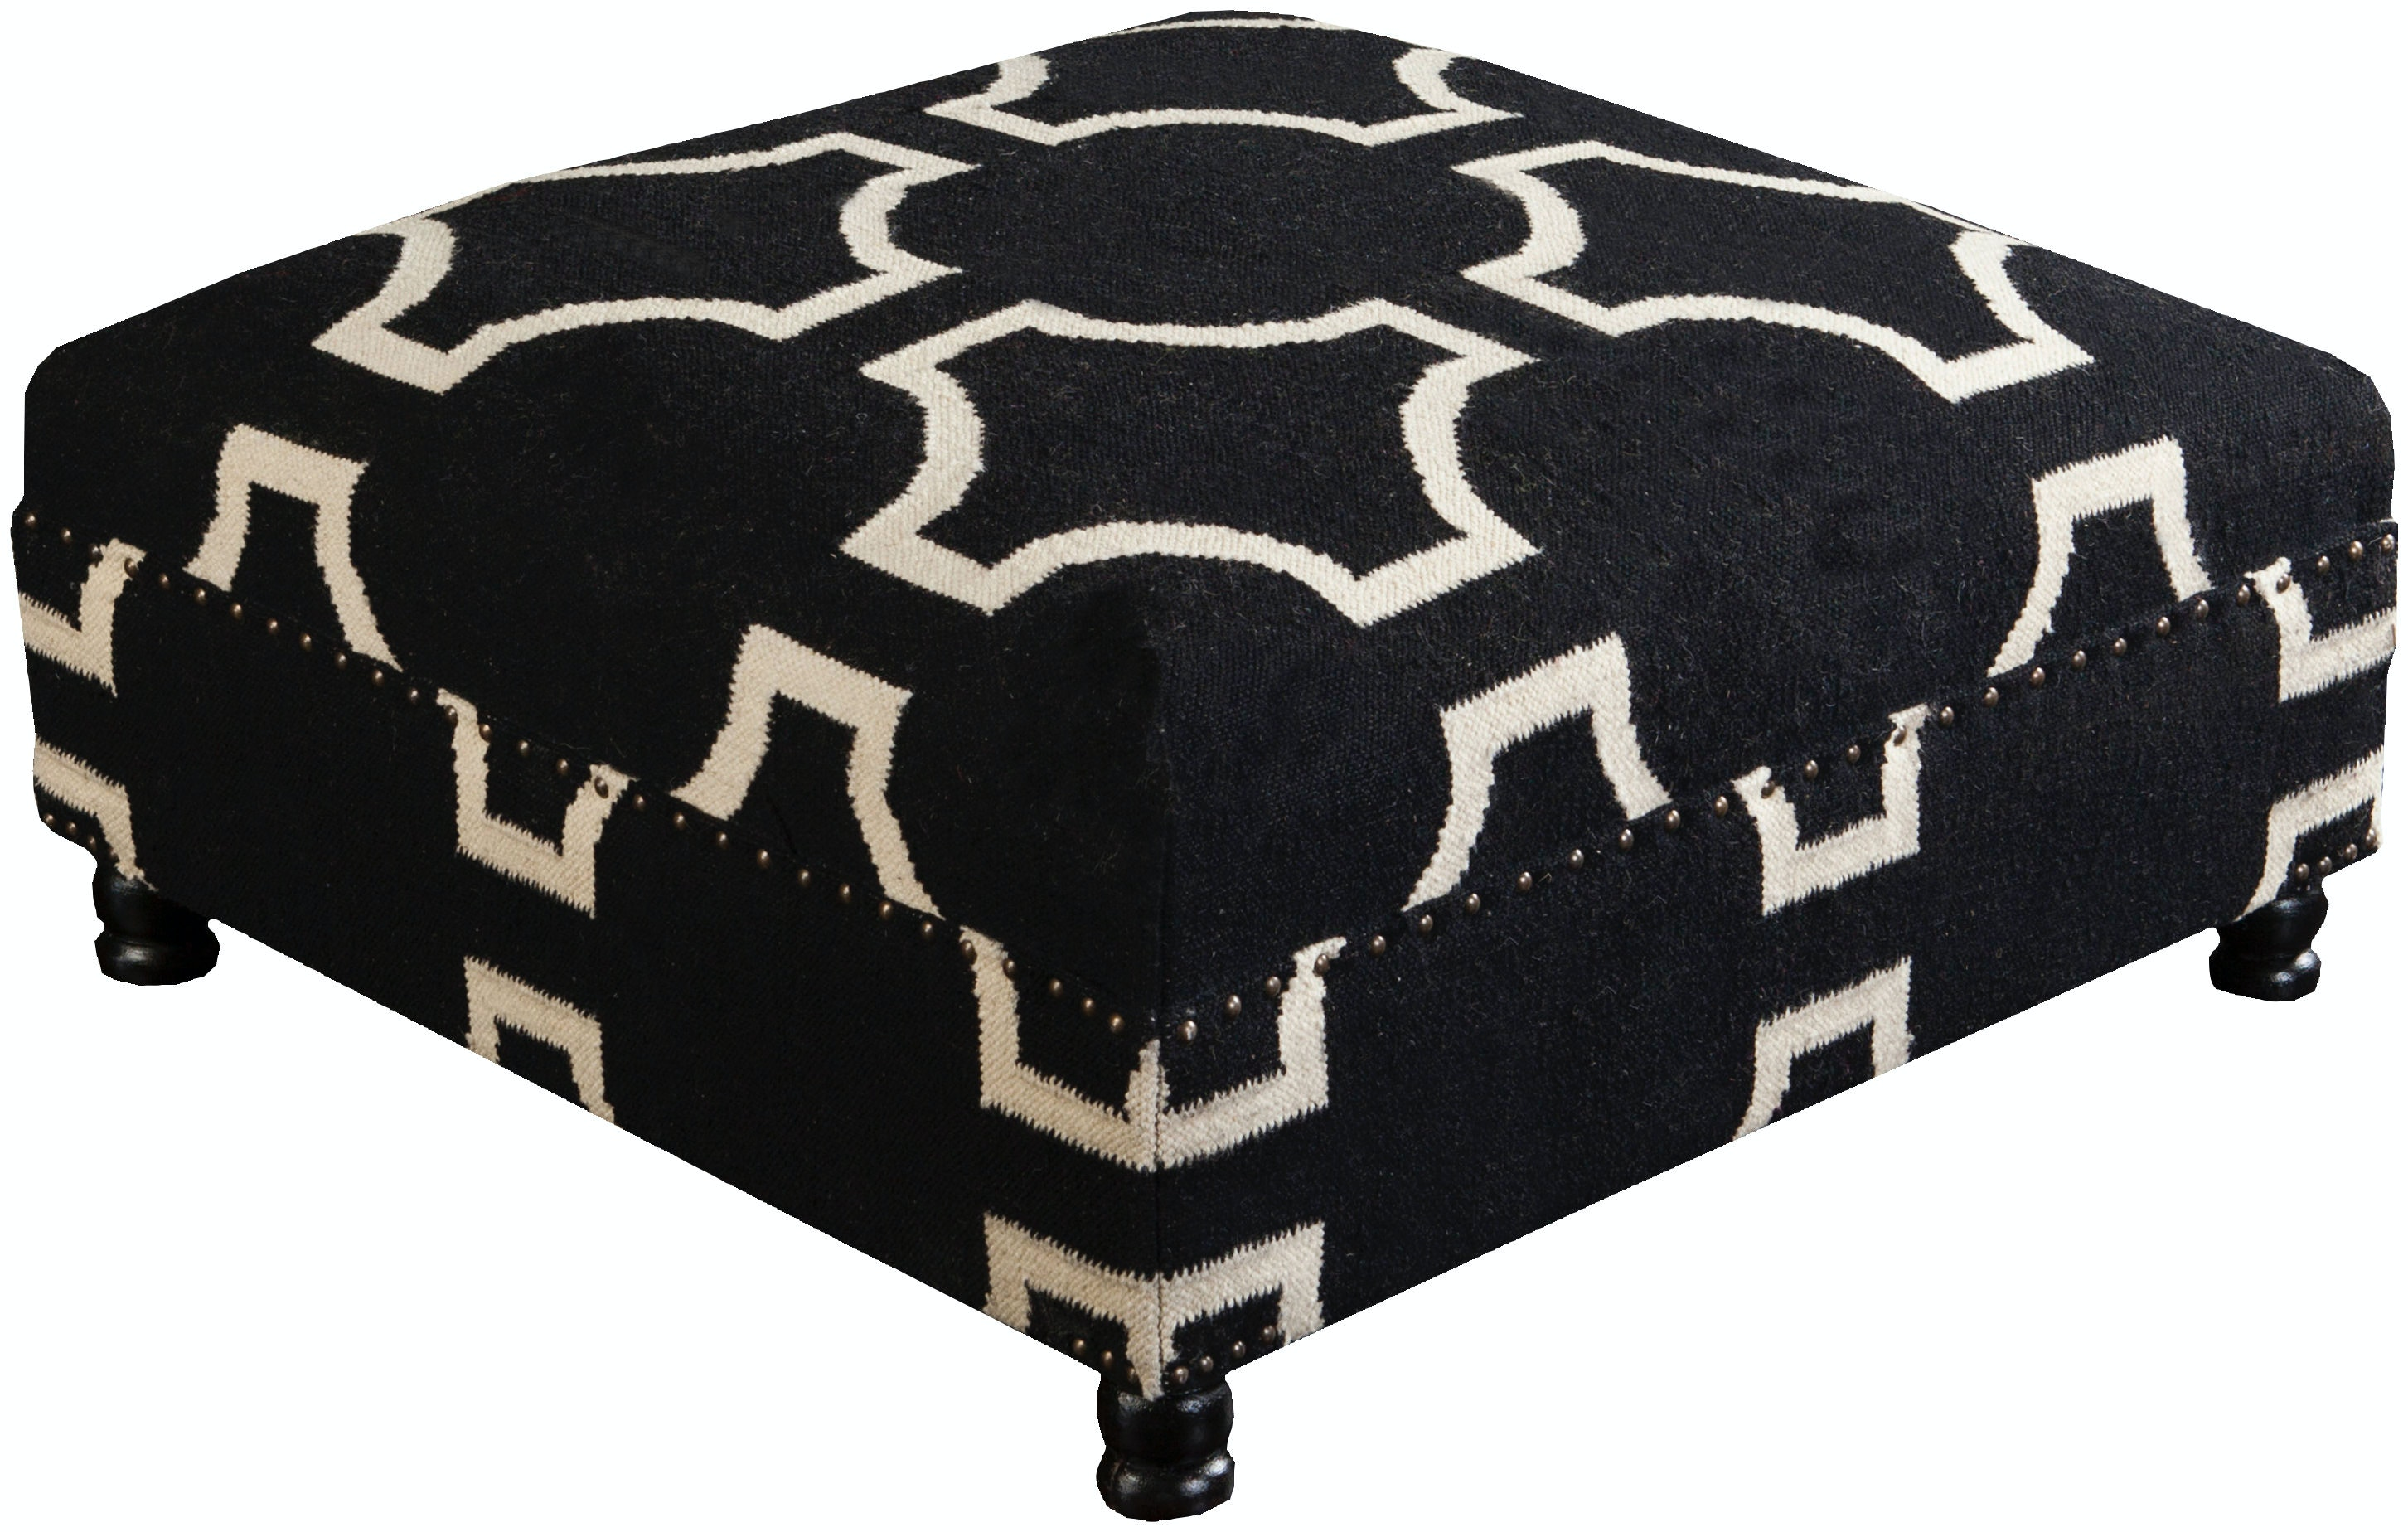 Living Room Surya Furniture 32 X 32 X 16 Ottoman FL1003 323216   The Sofa  Store   Towson, Glen Burnie And Baltimore, MD